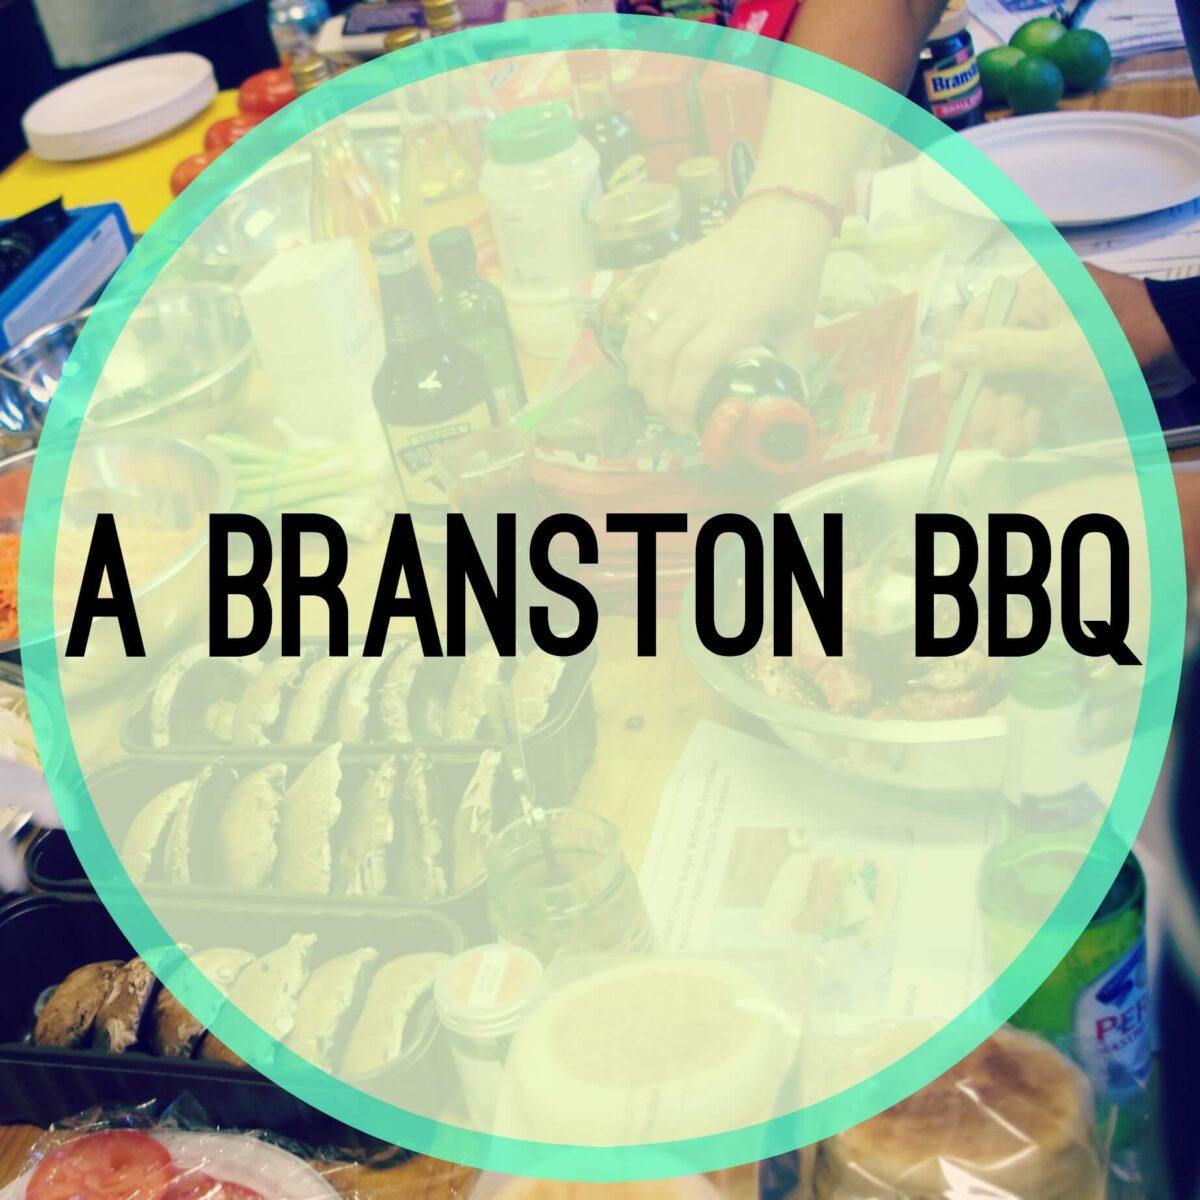 A Branston BBQ